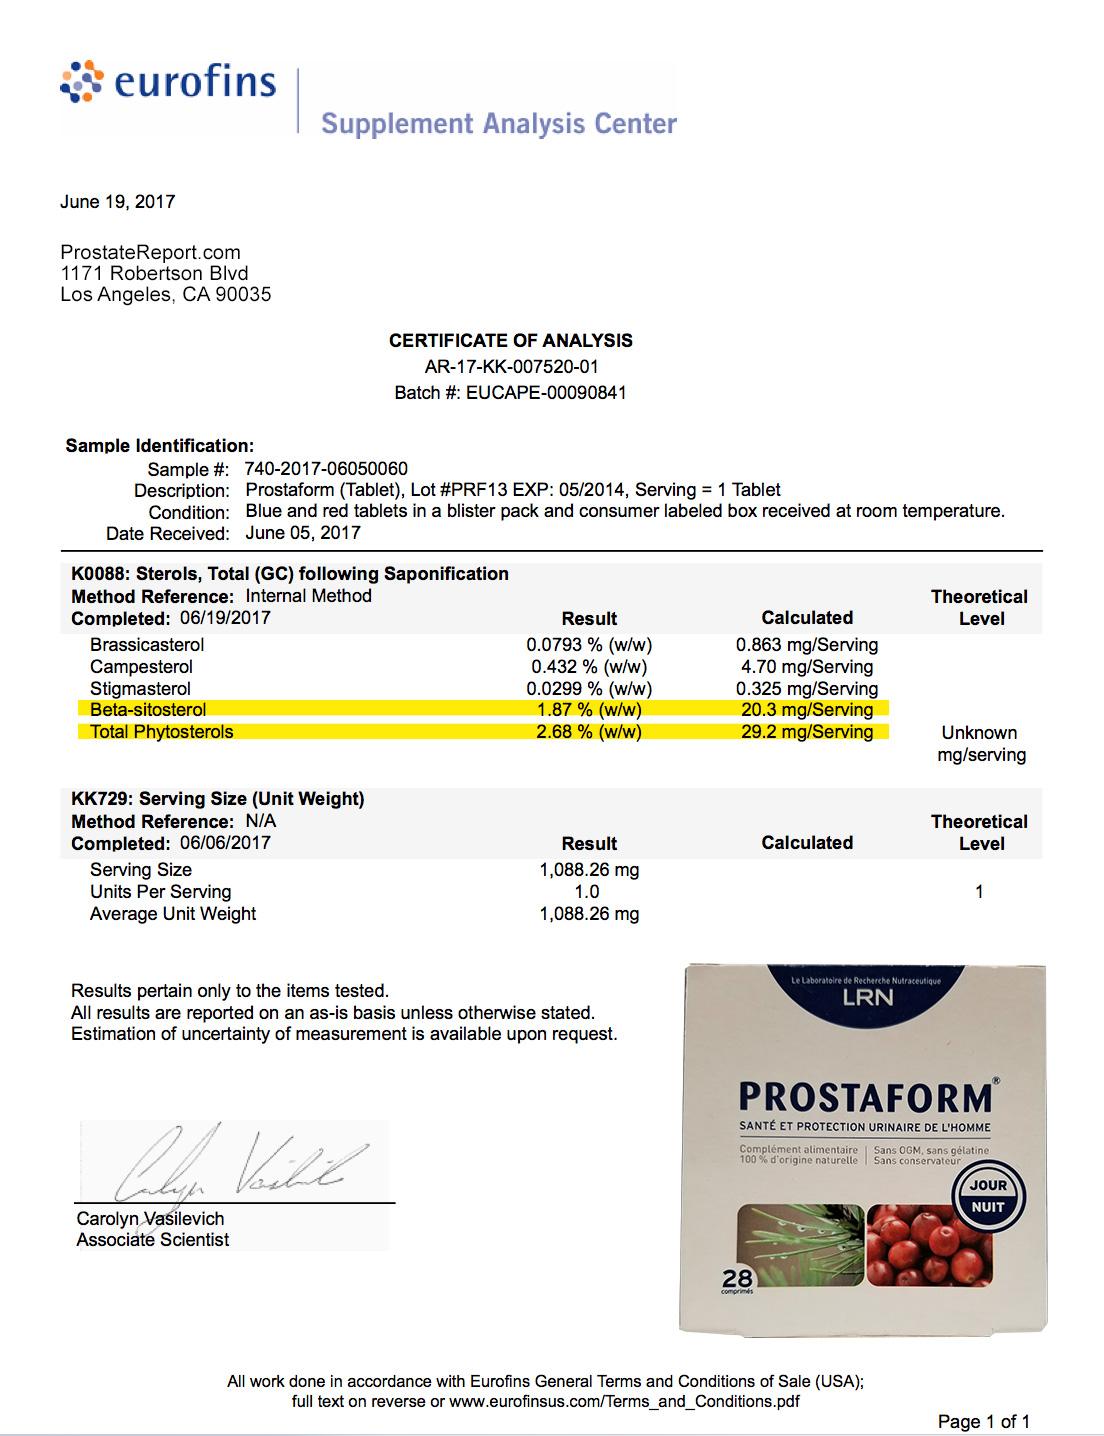 Prostaform lab report